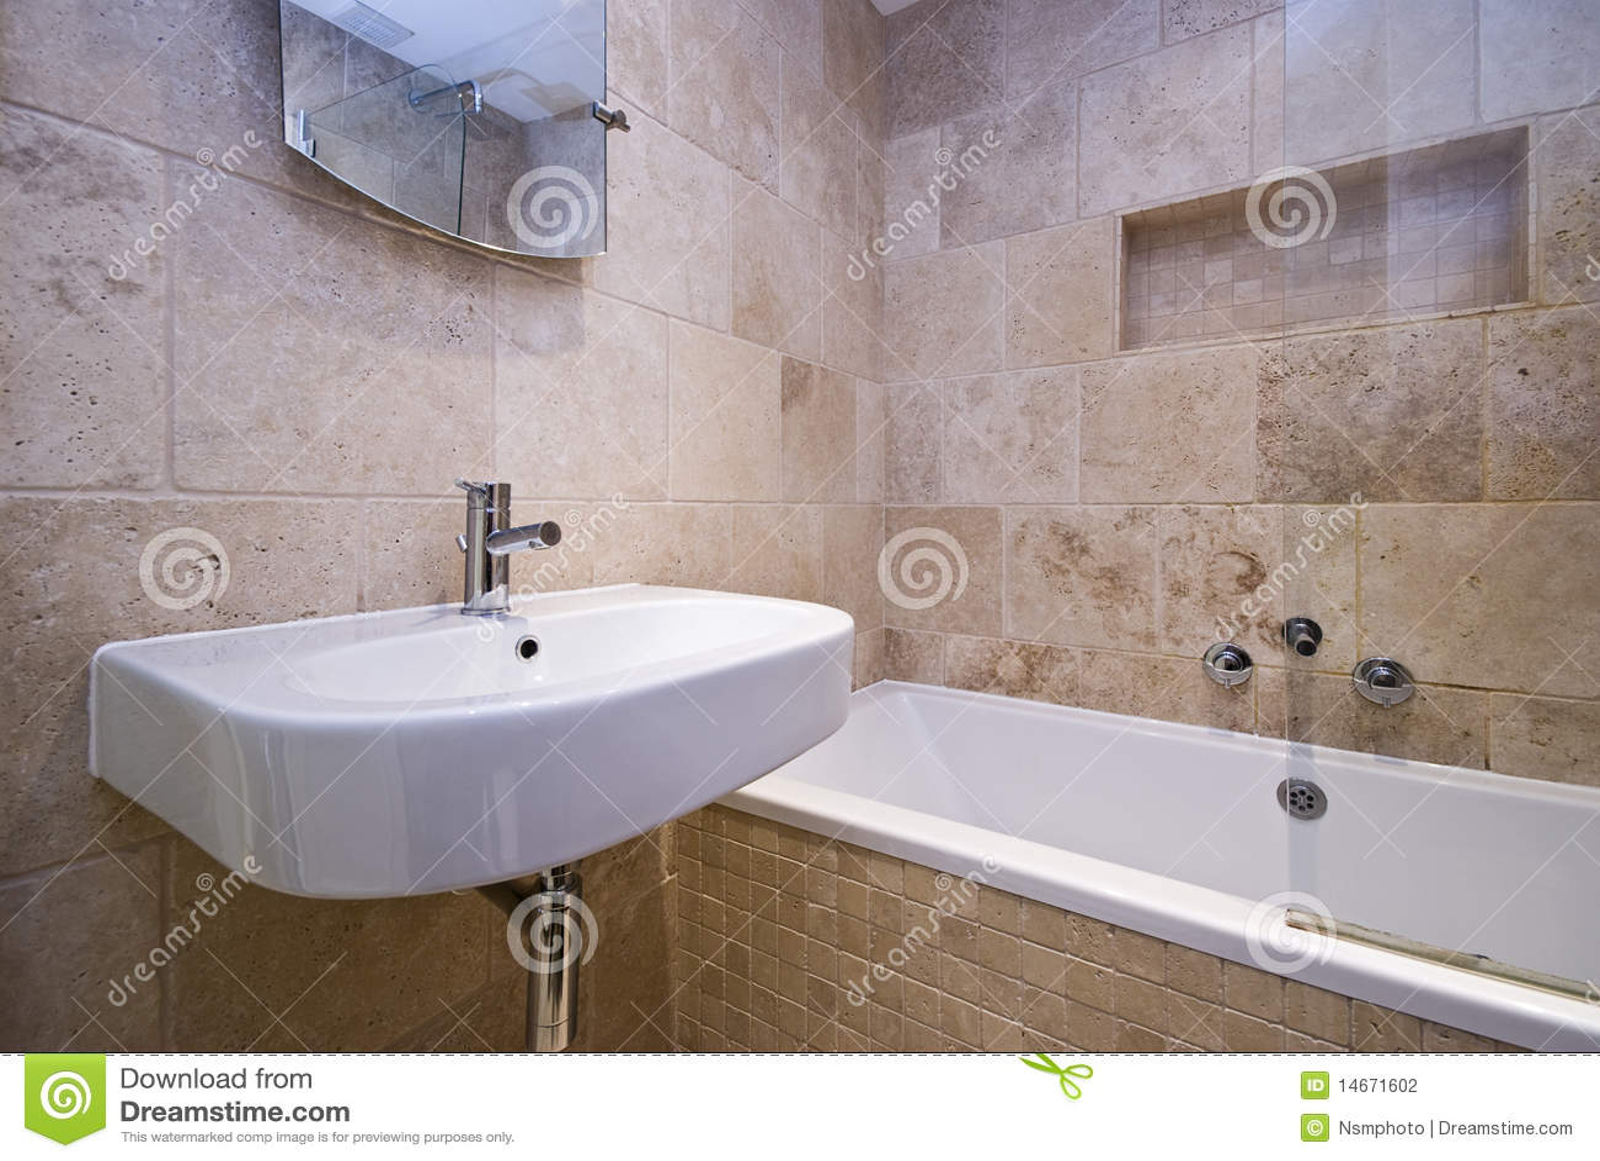 Luxury Bathroom With Stone Tiled Walls Stock Photo - Image of ...